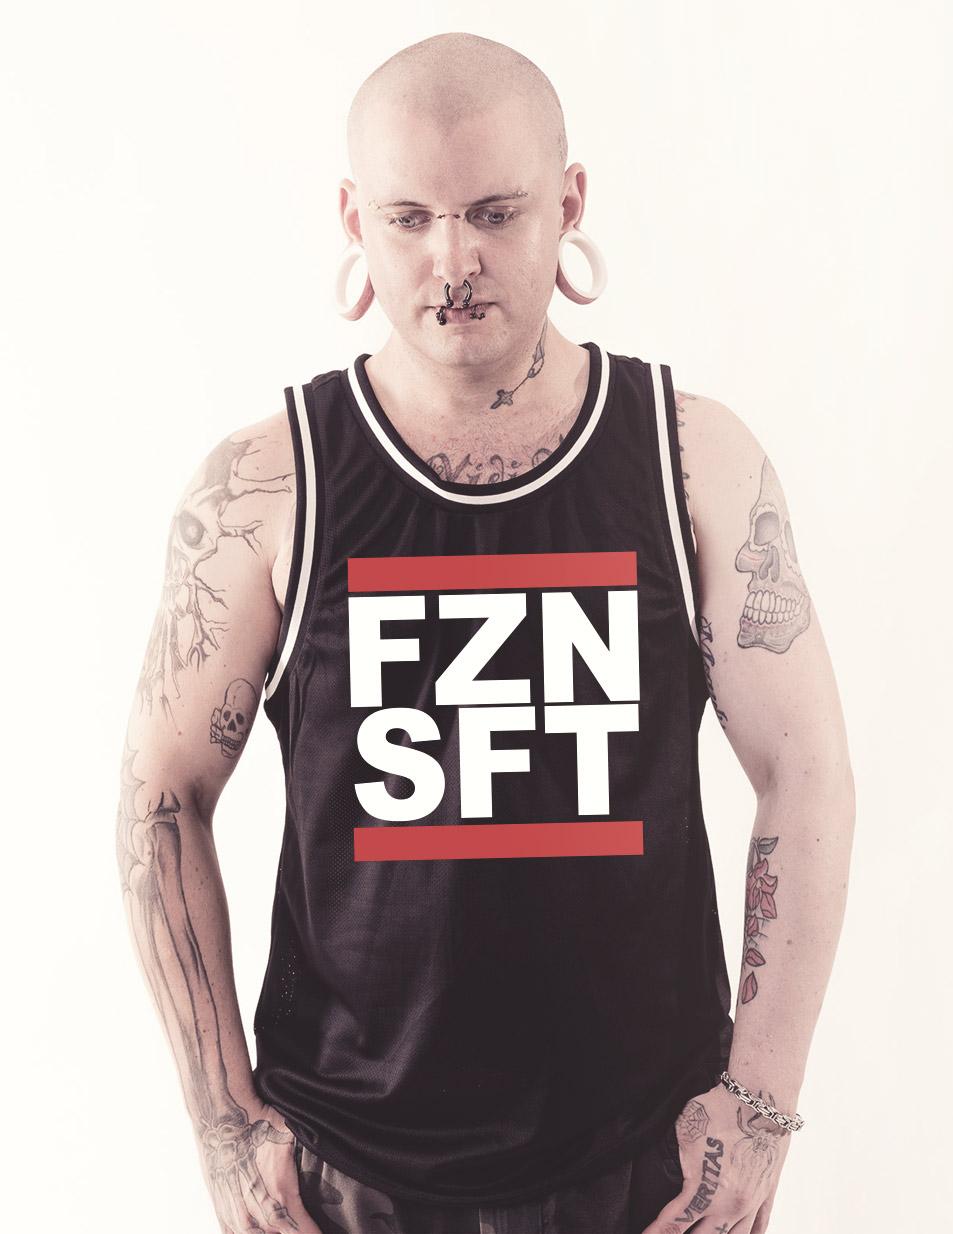 FZNSFT Mesh Tank Top mehrfarbig auf schwarz